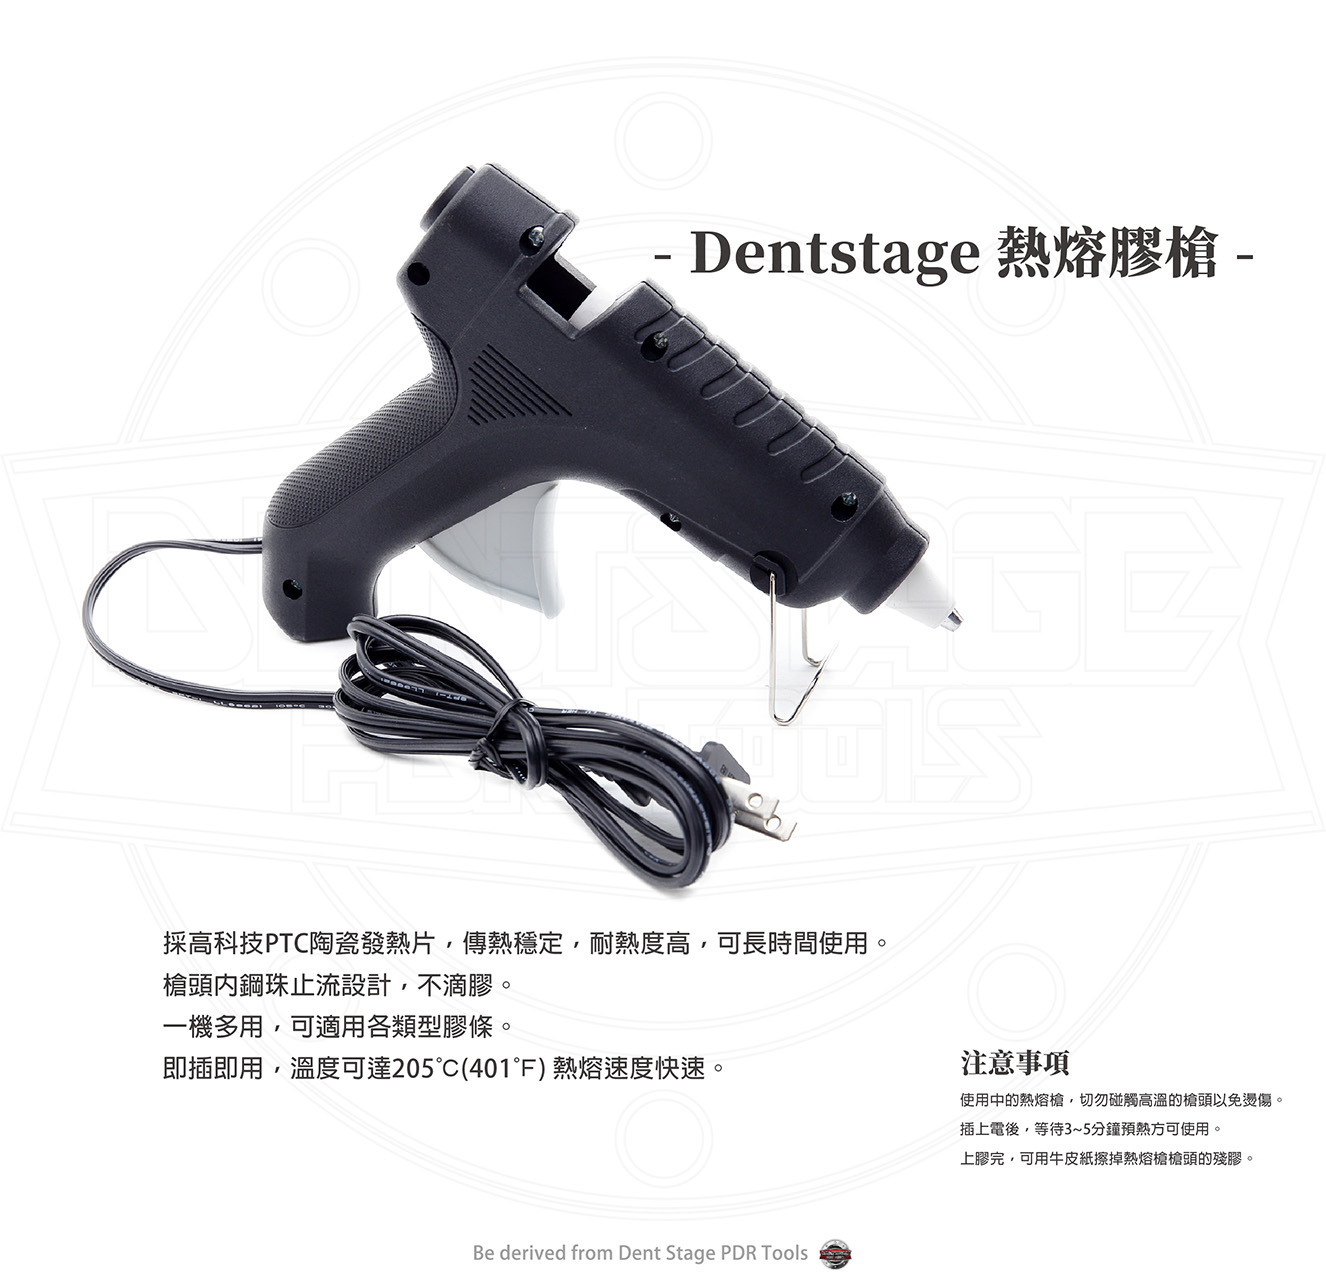 Dentstage 熱熔膠槍_02.jpg